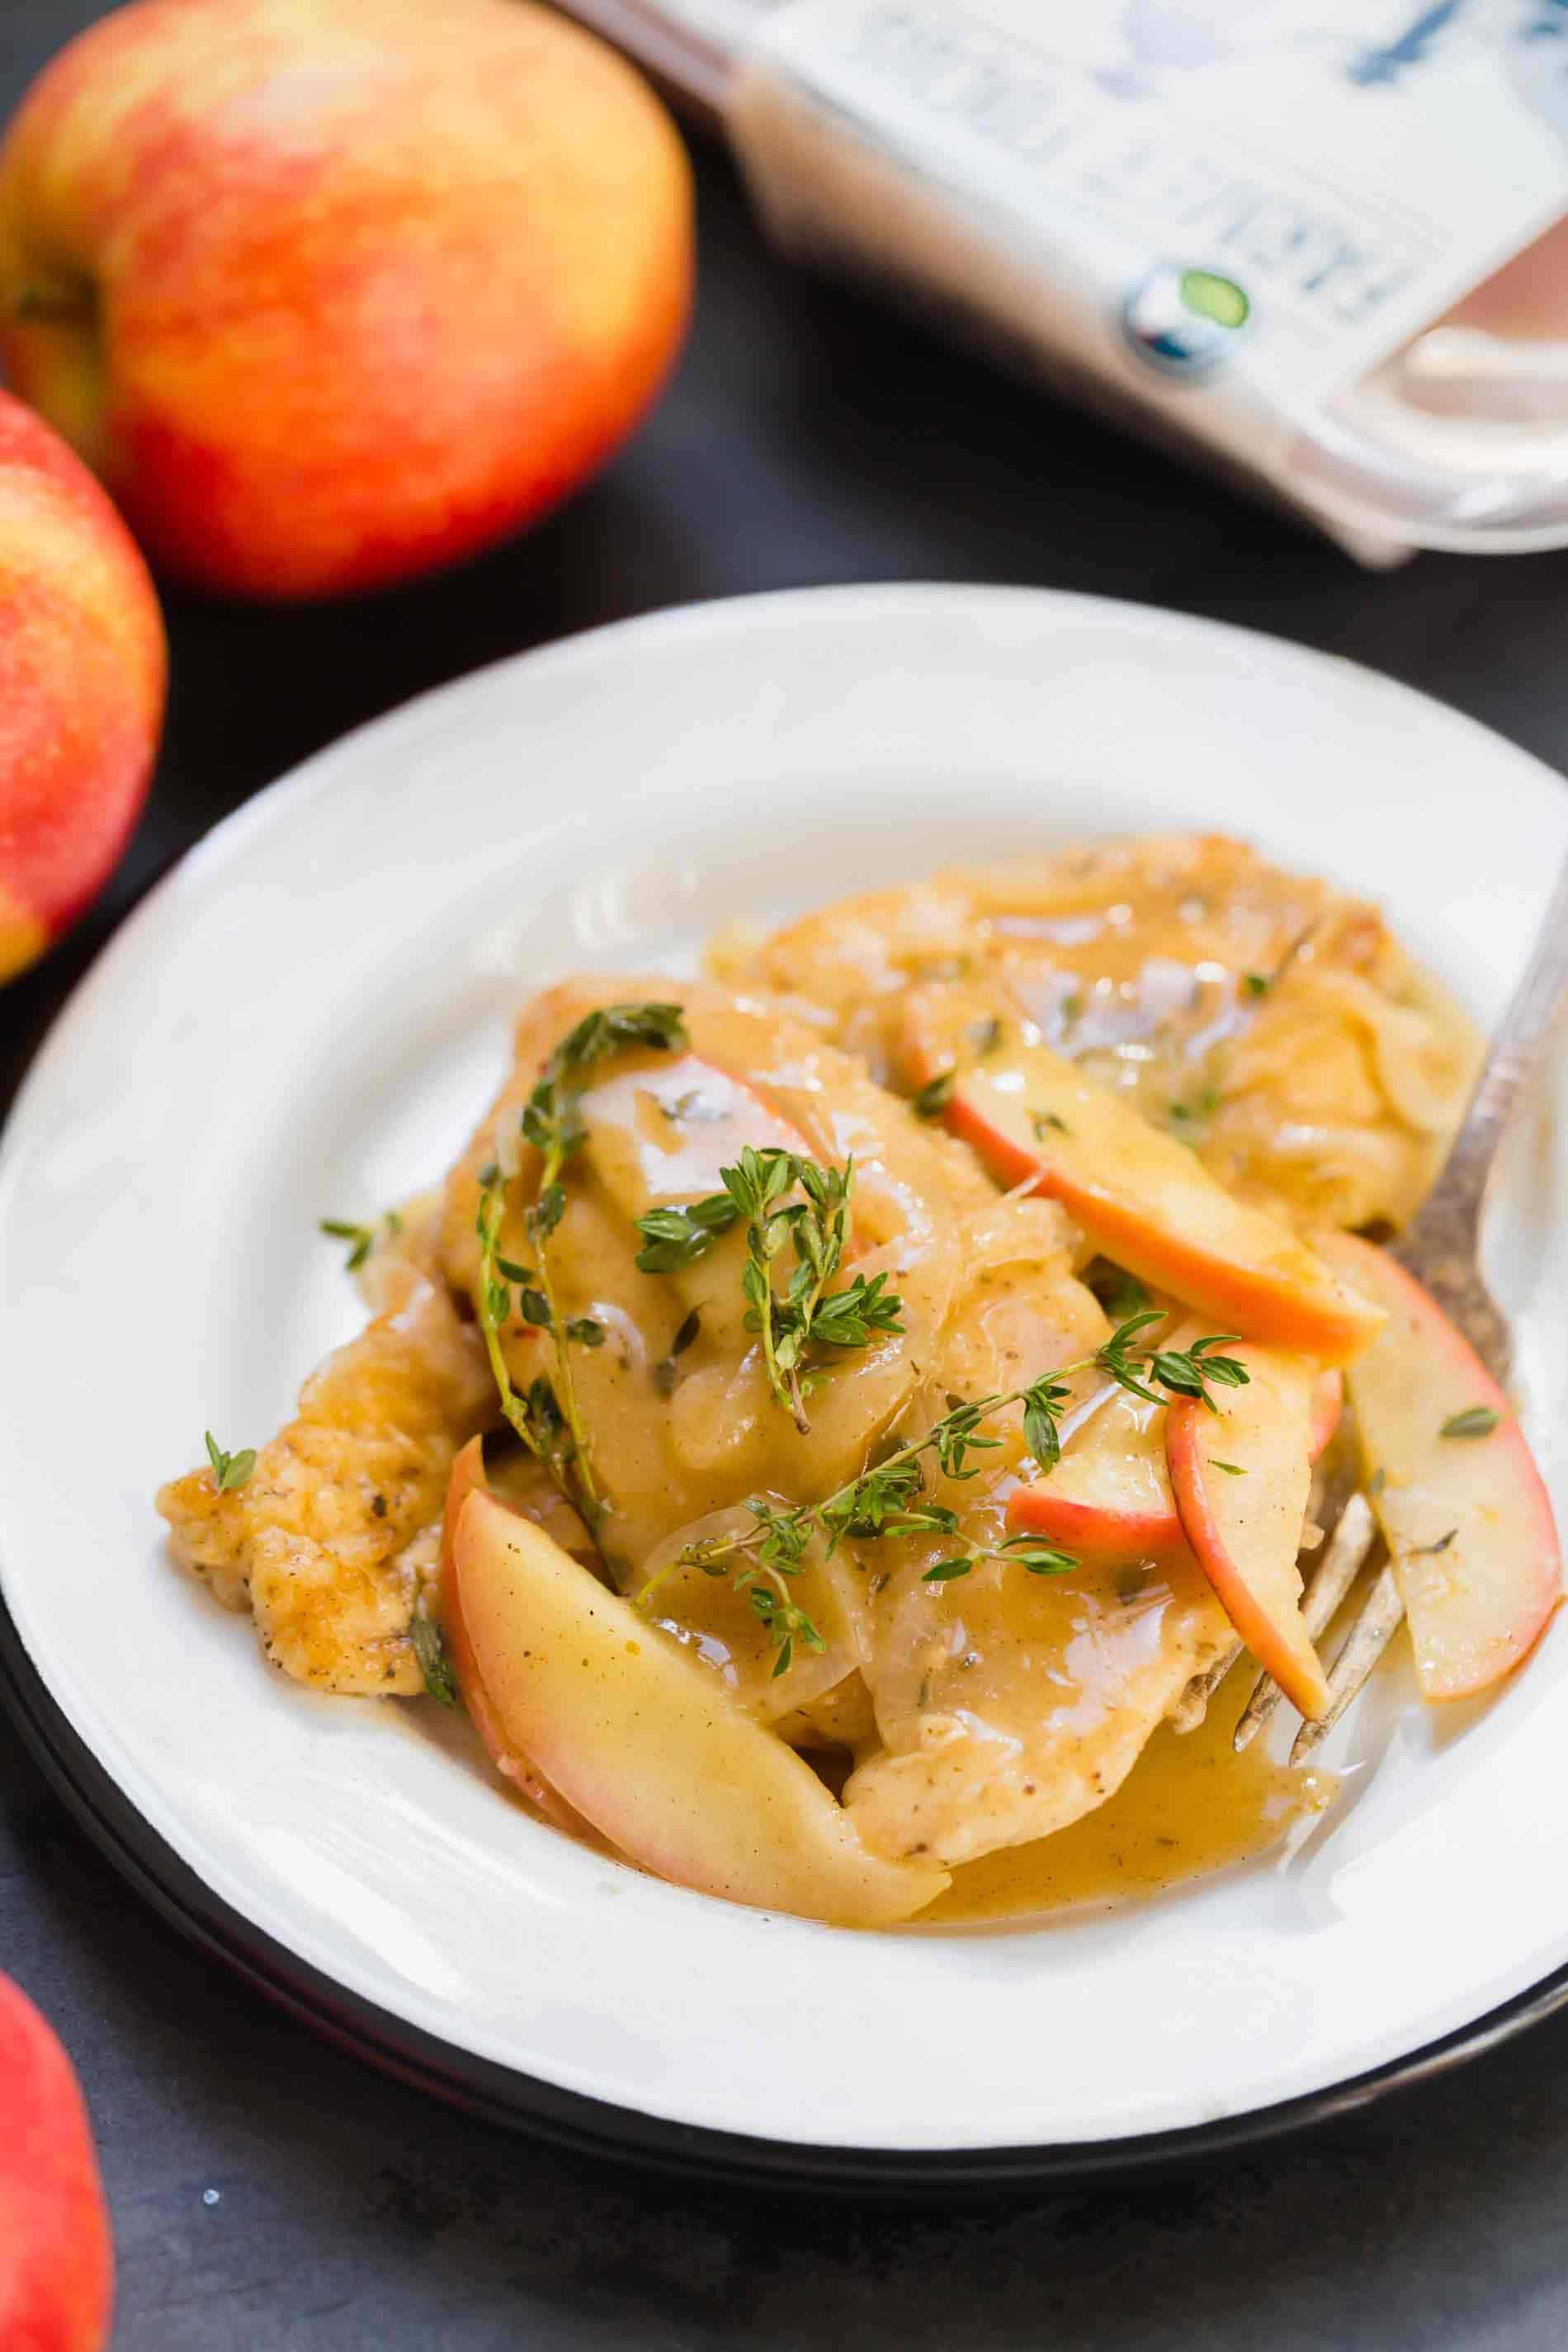 Apple cider chicken skillet served on white plate